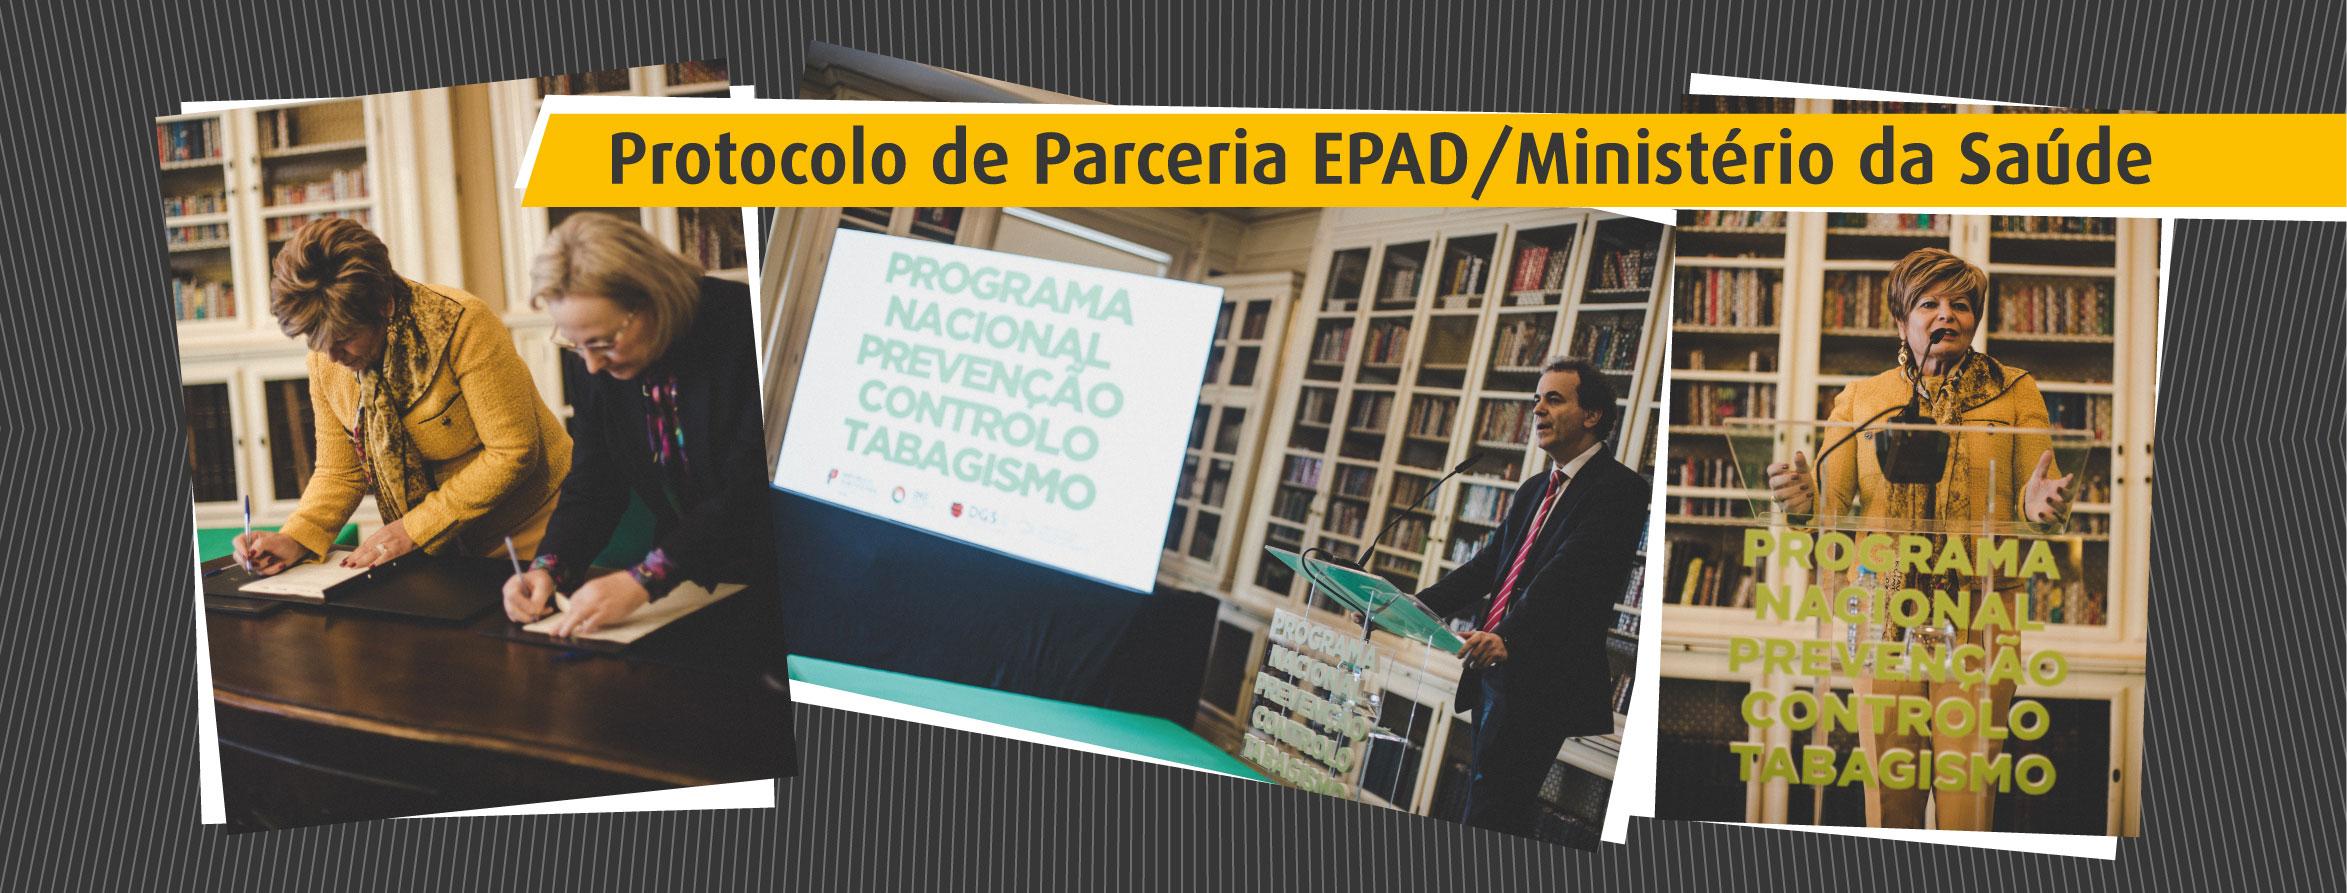 Slider_Protocolo_EPAD-MS